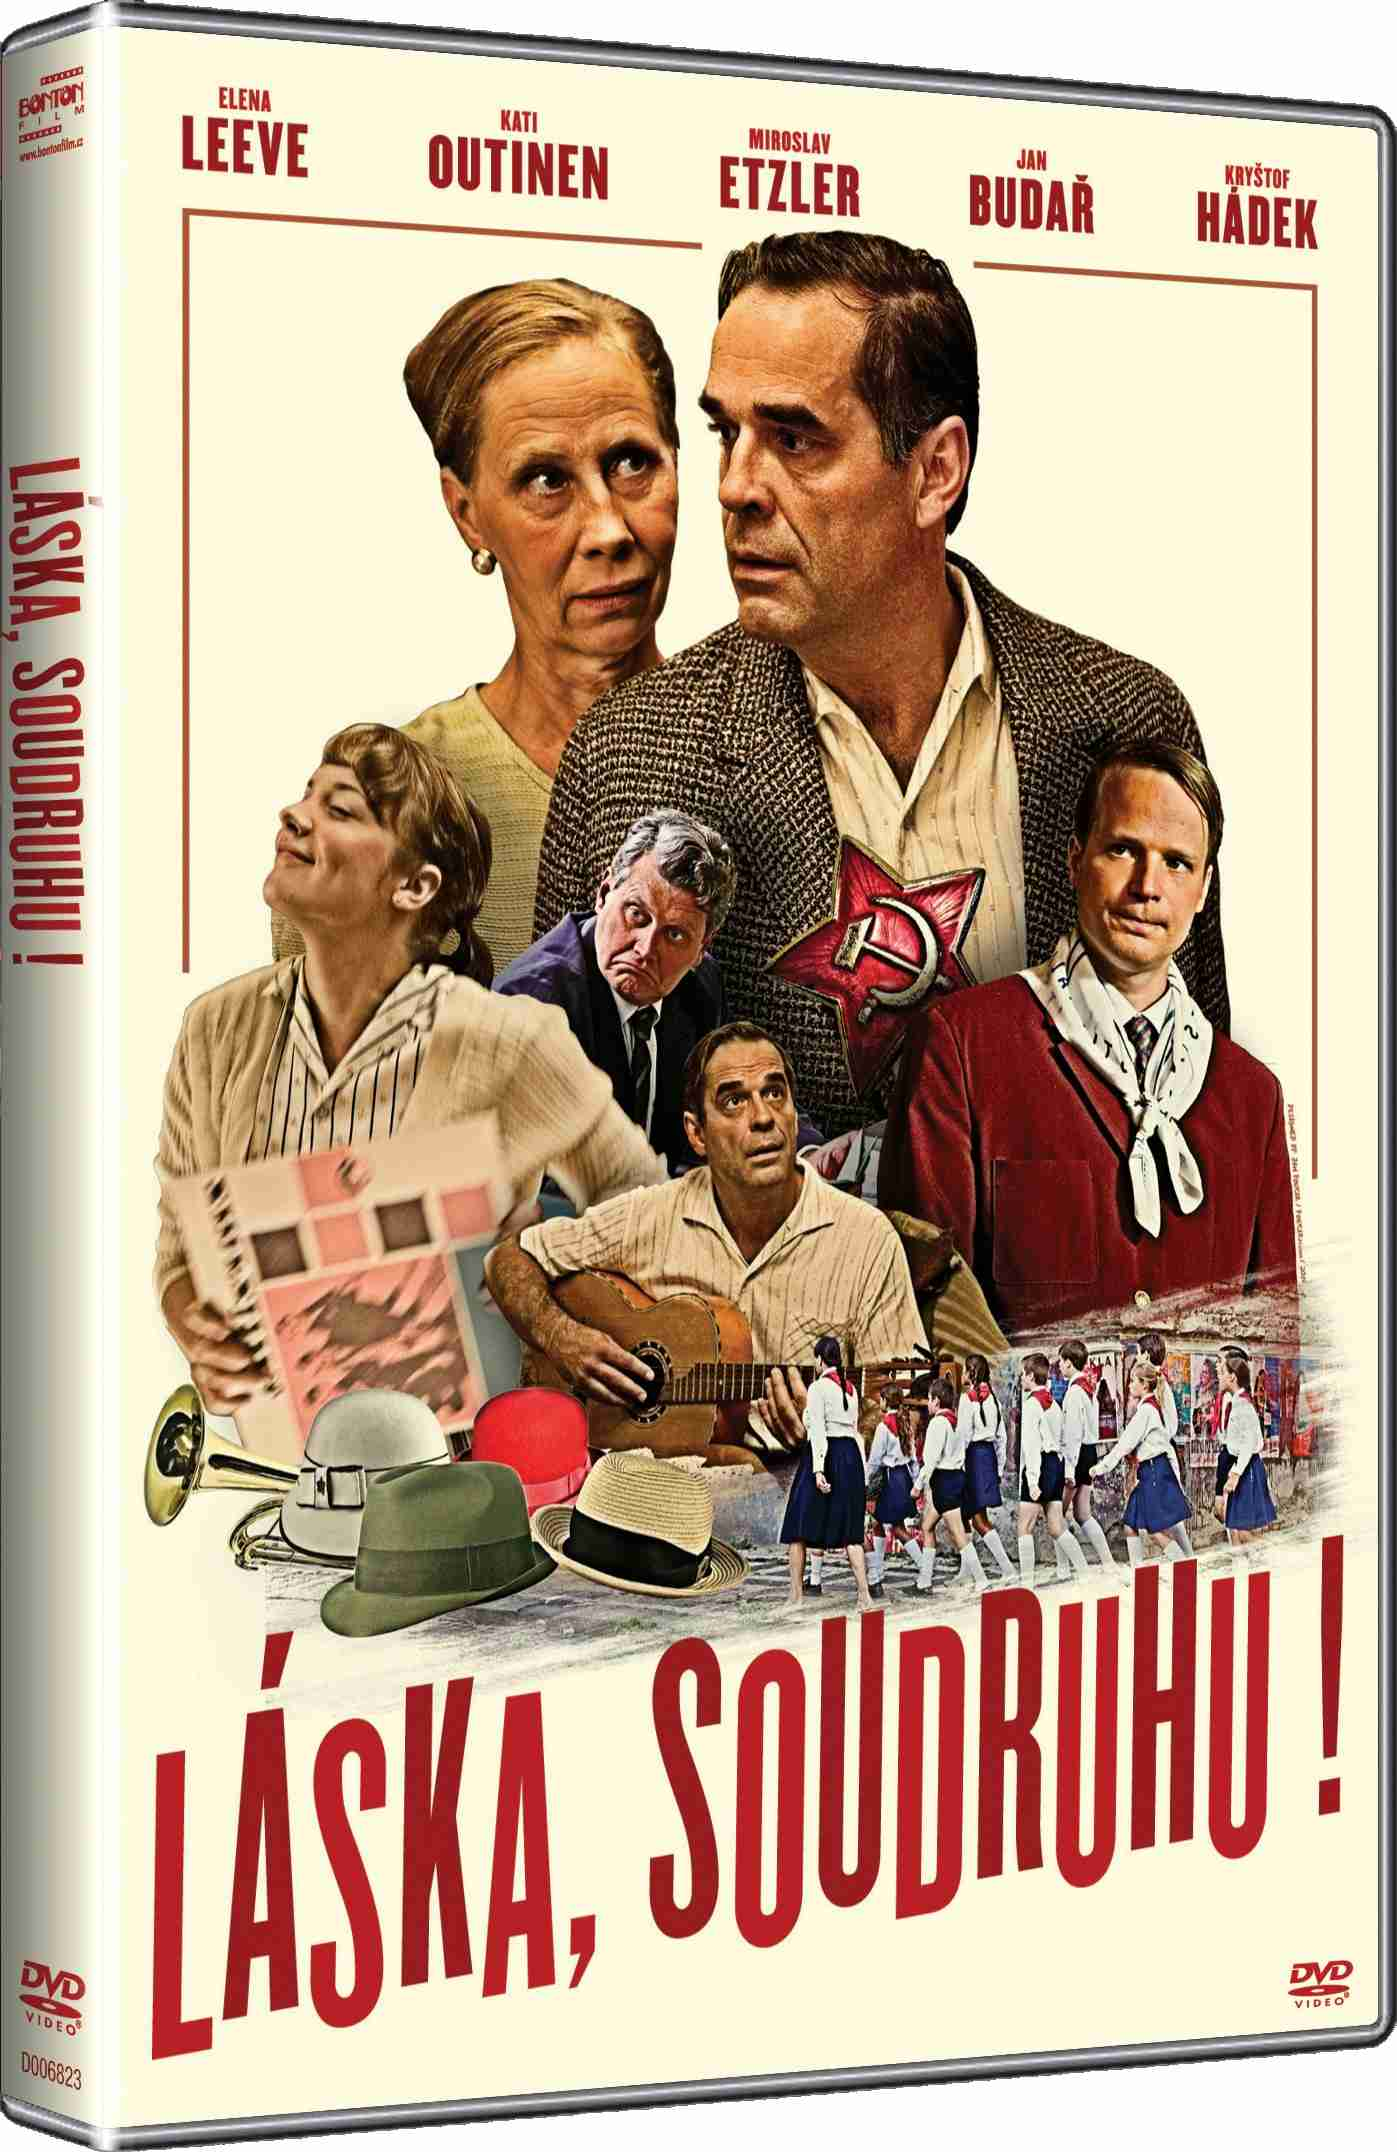 LÁSKA, SOUDRUHU - DVD